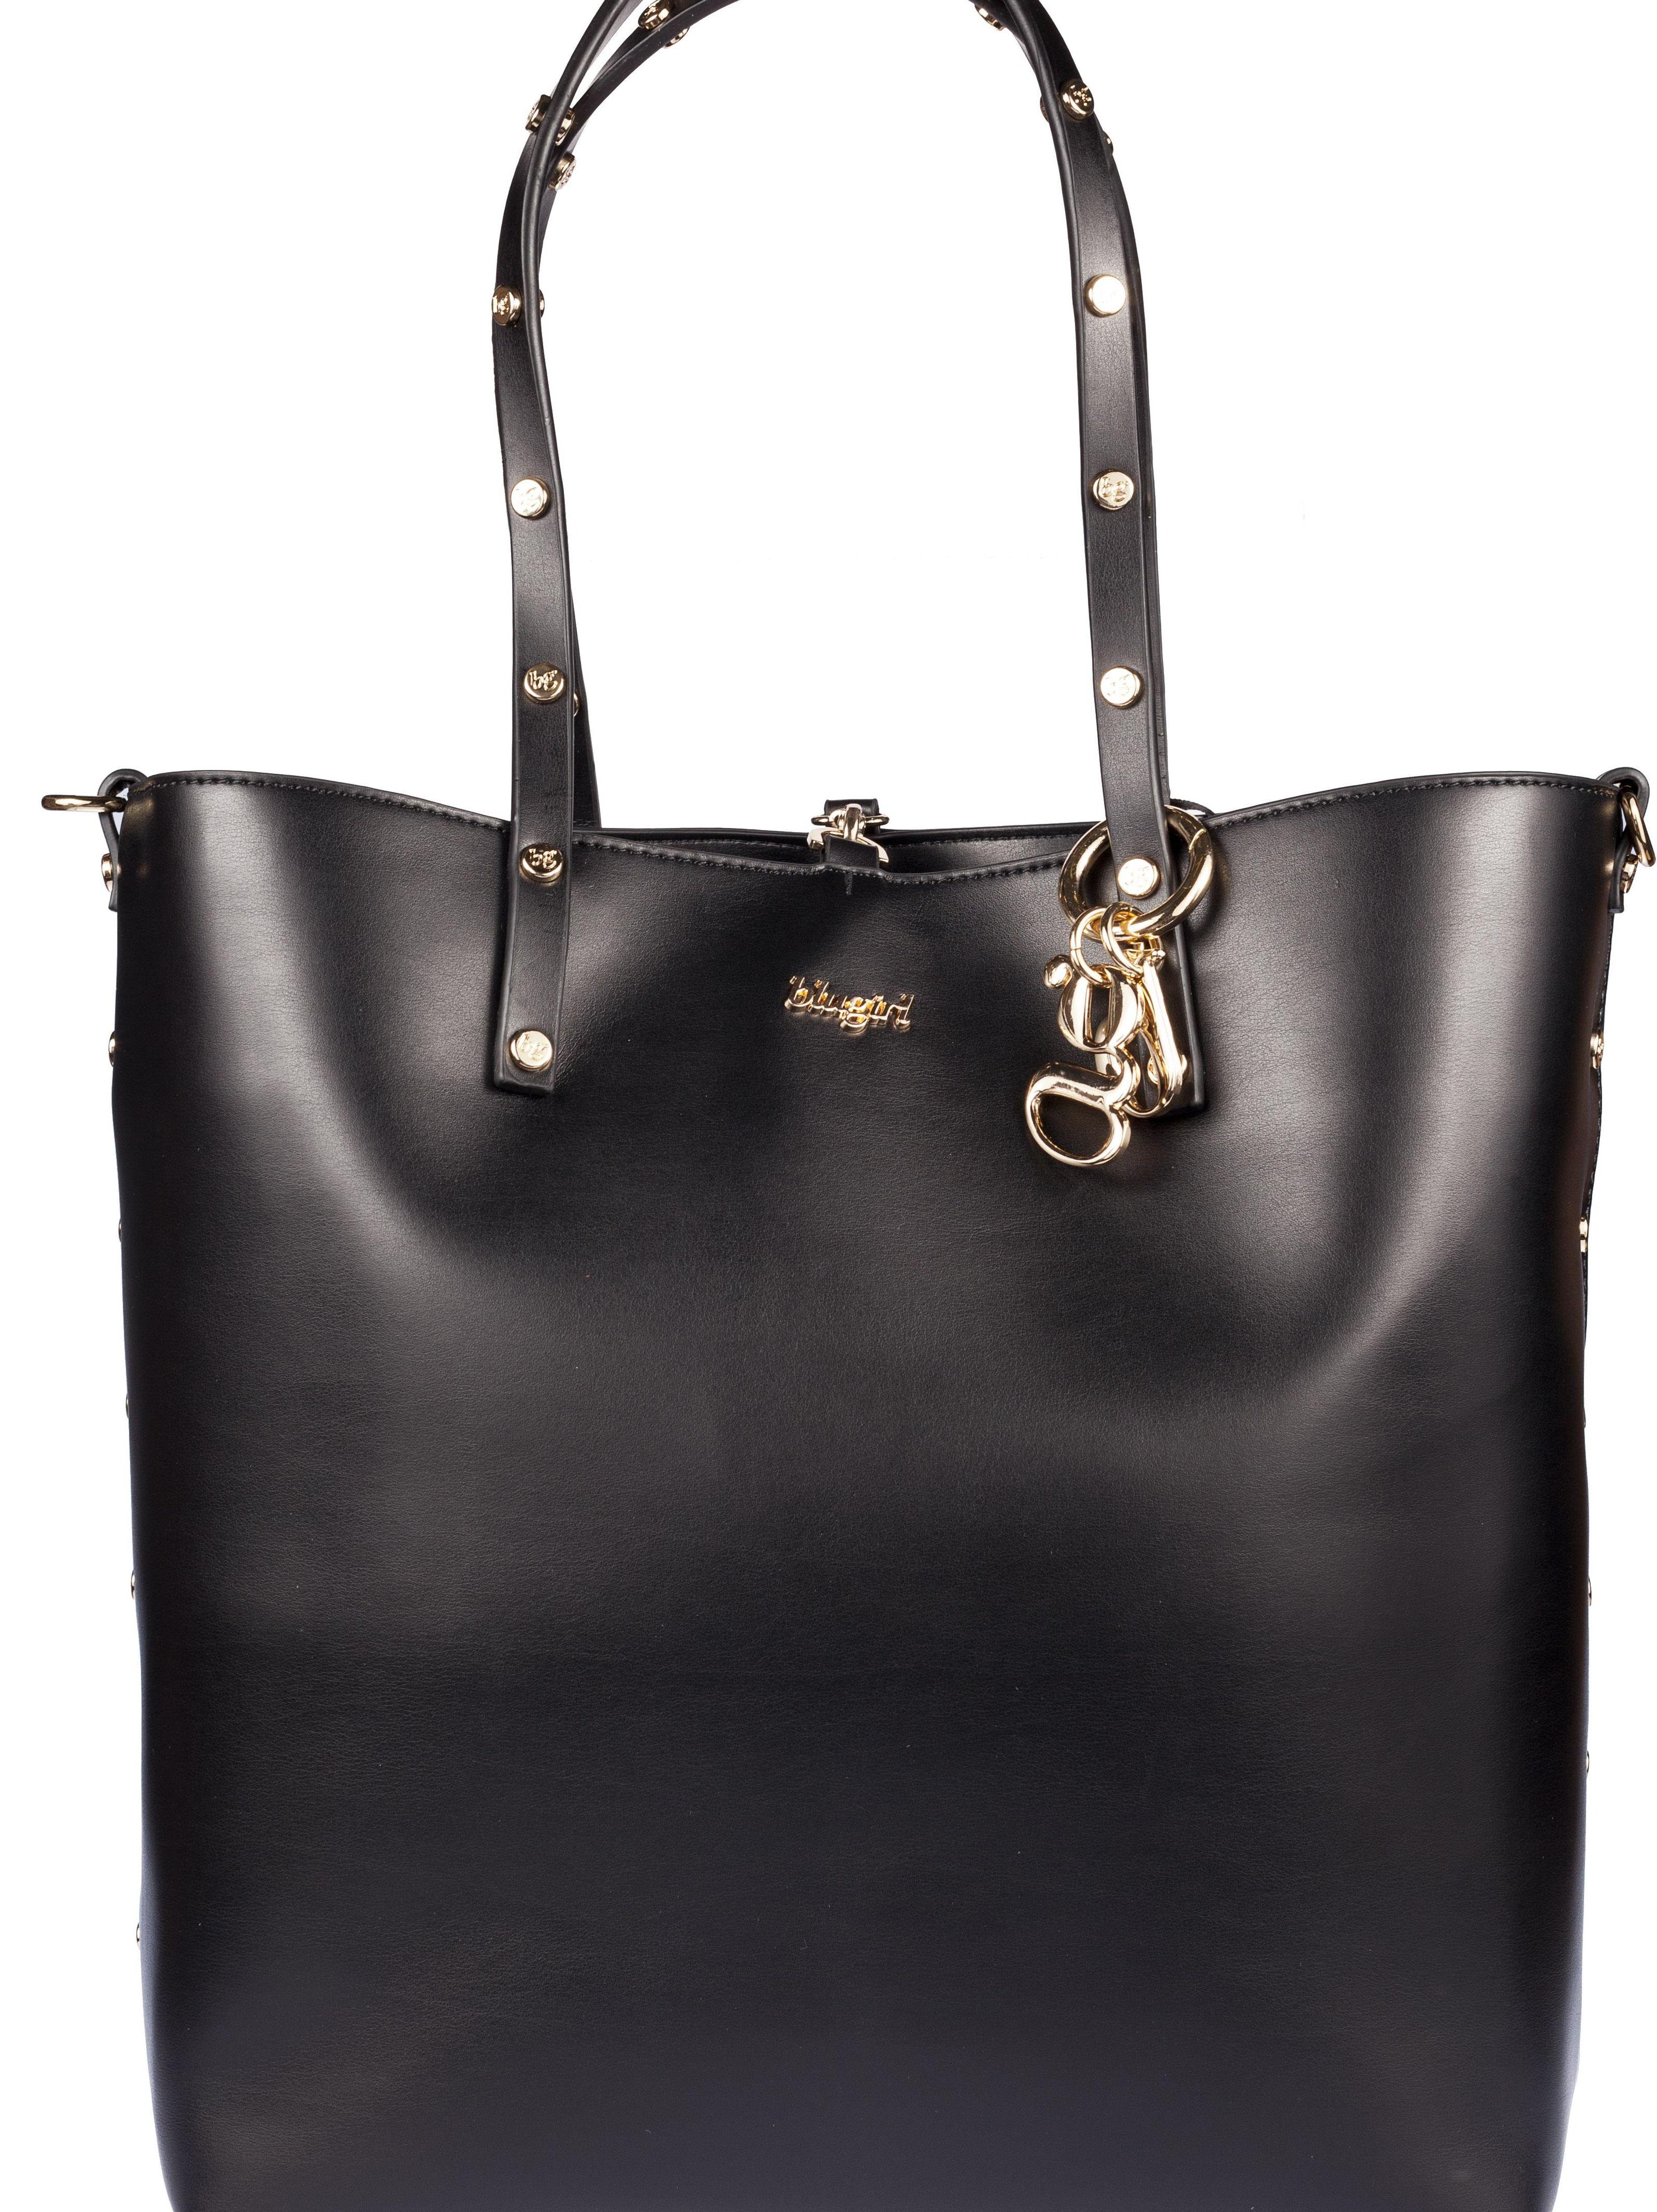 Blugirl Studded Shopper Bag